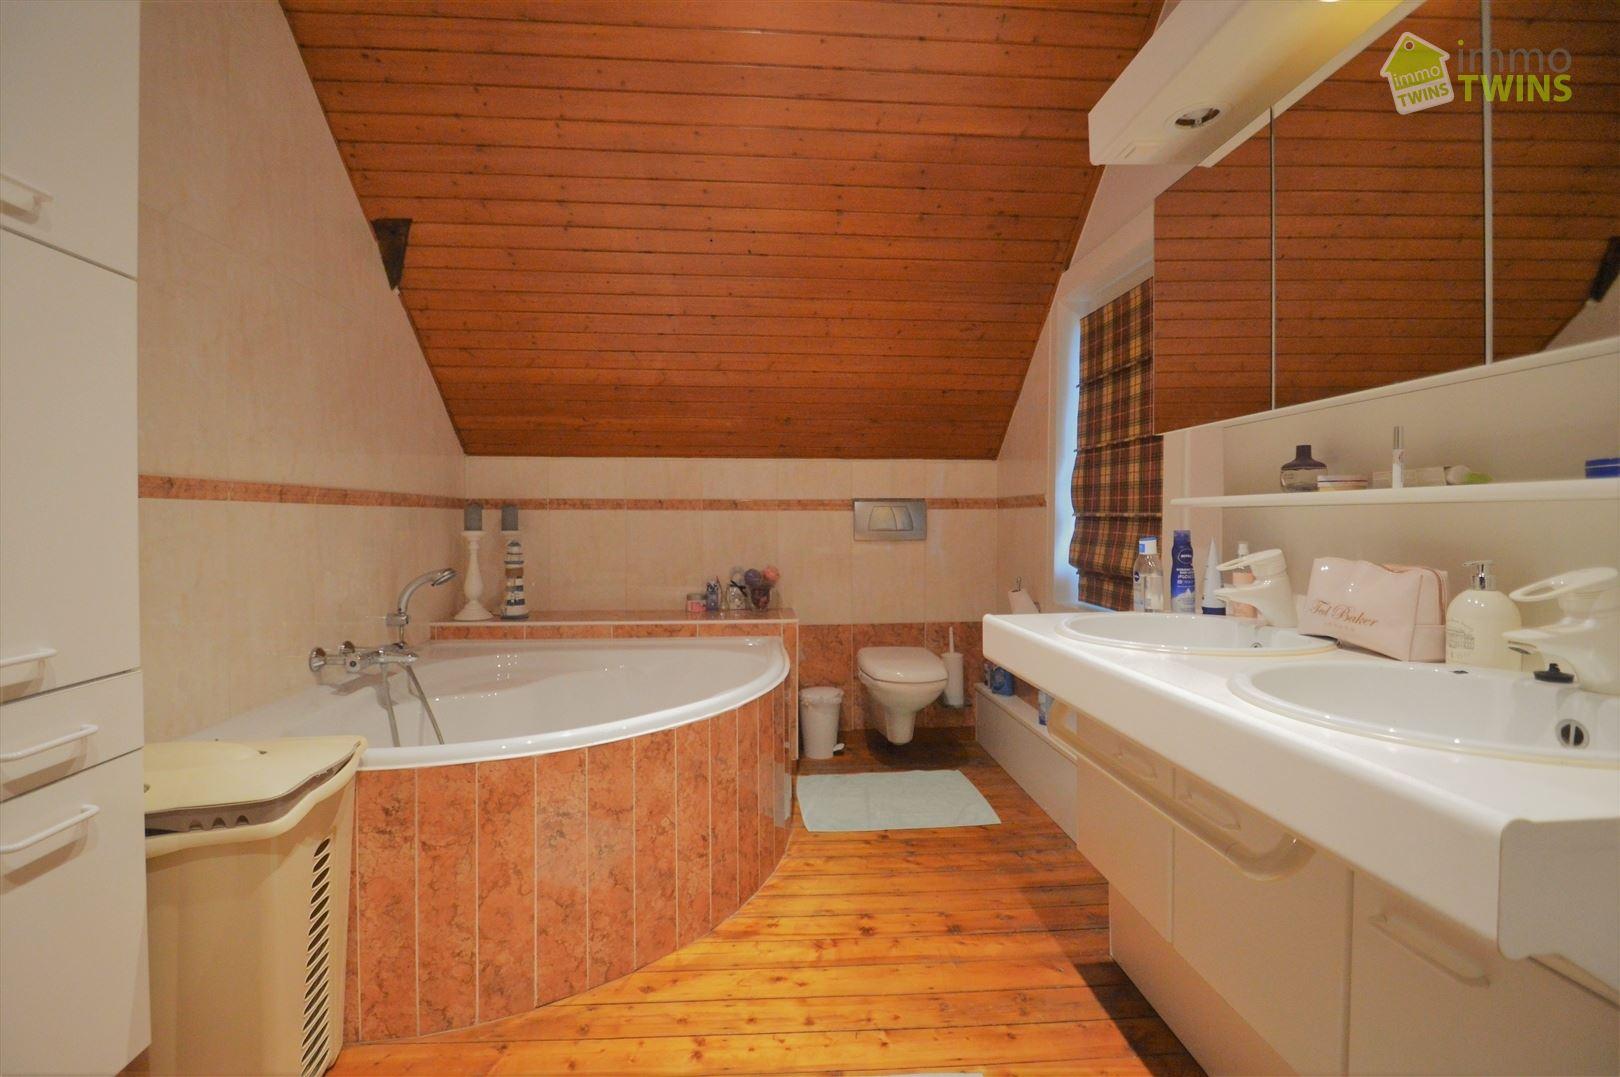 Foto 17 : Duplex/Penthouse te 2890 SINT-AMANDS (België) - Prijs € 429.000